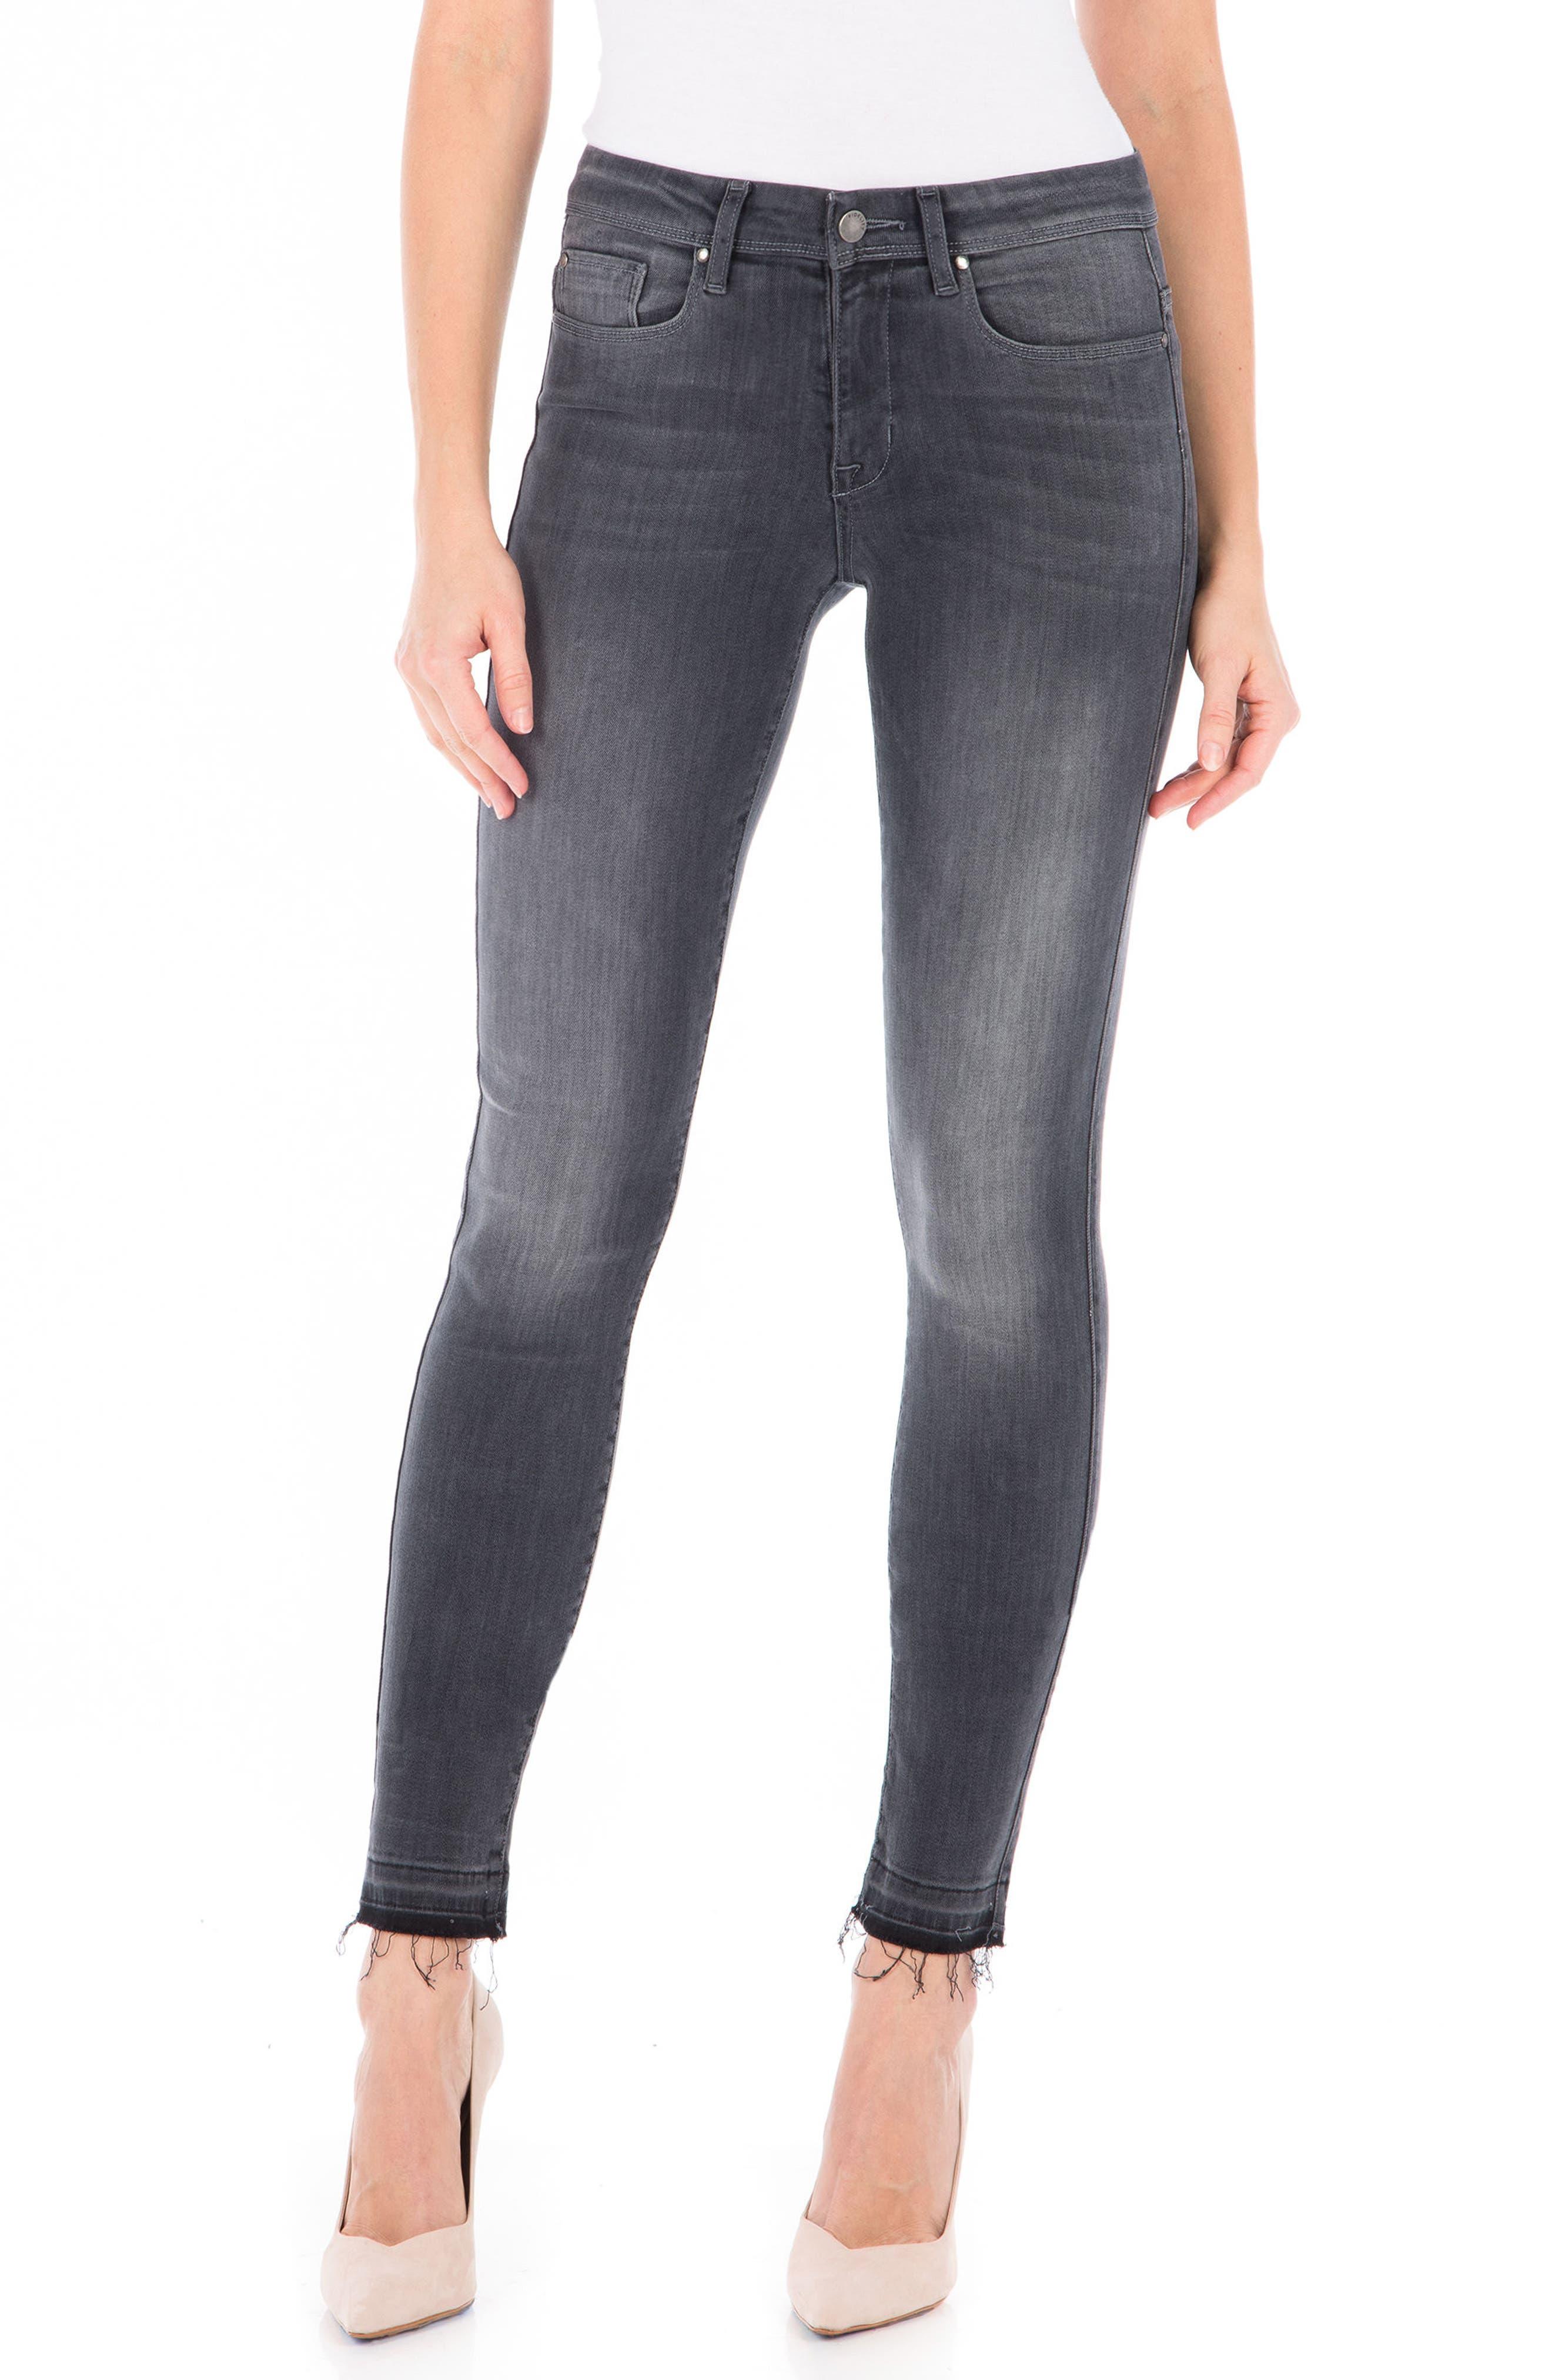 Gwen High Waist Skinny Jeans,                             Main thumbnail 1, color,                             Mystic Black